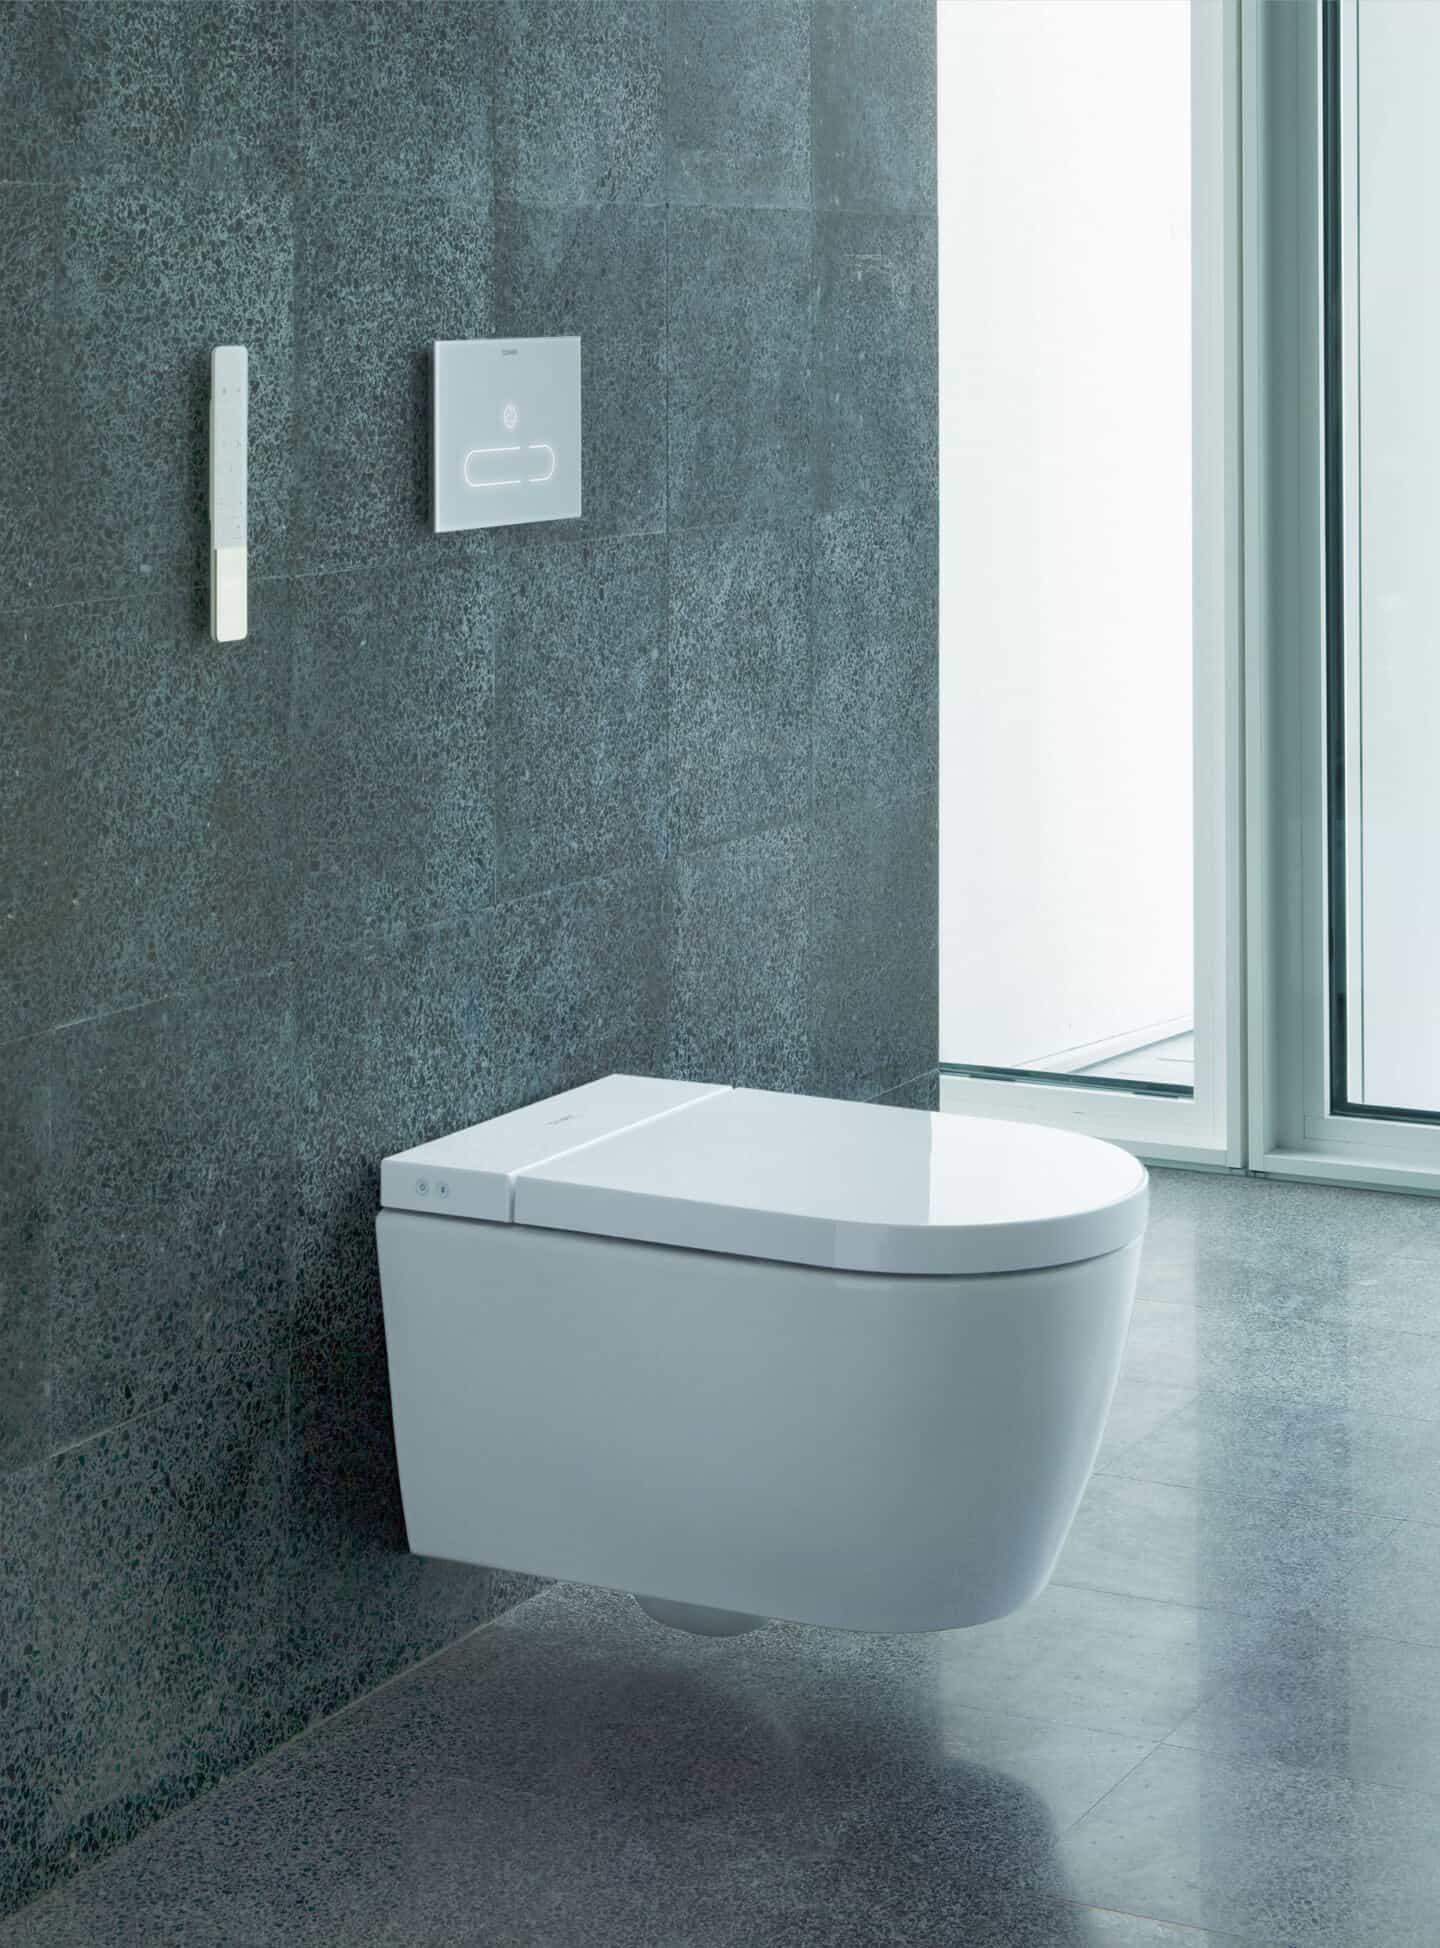 Duravit SensoWash Stark f shower toilet for increased hygiene in the bathroom